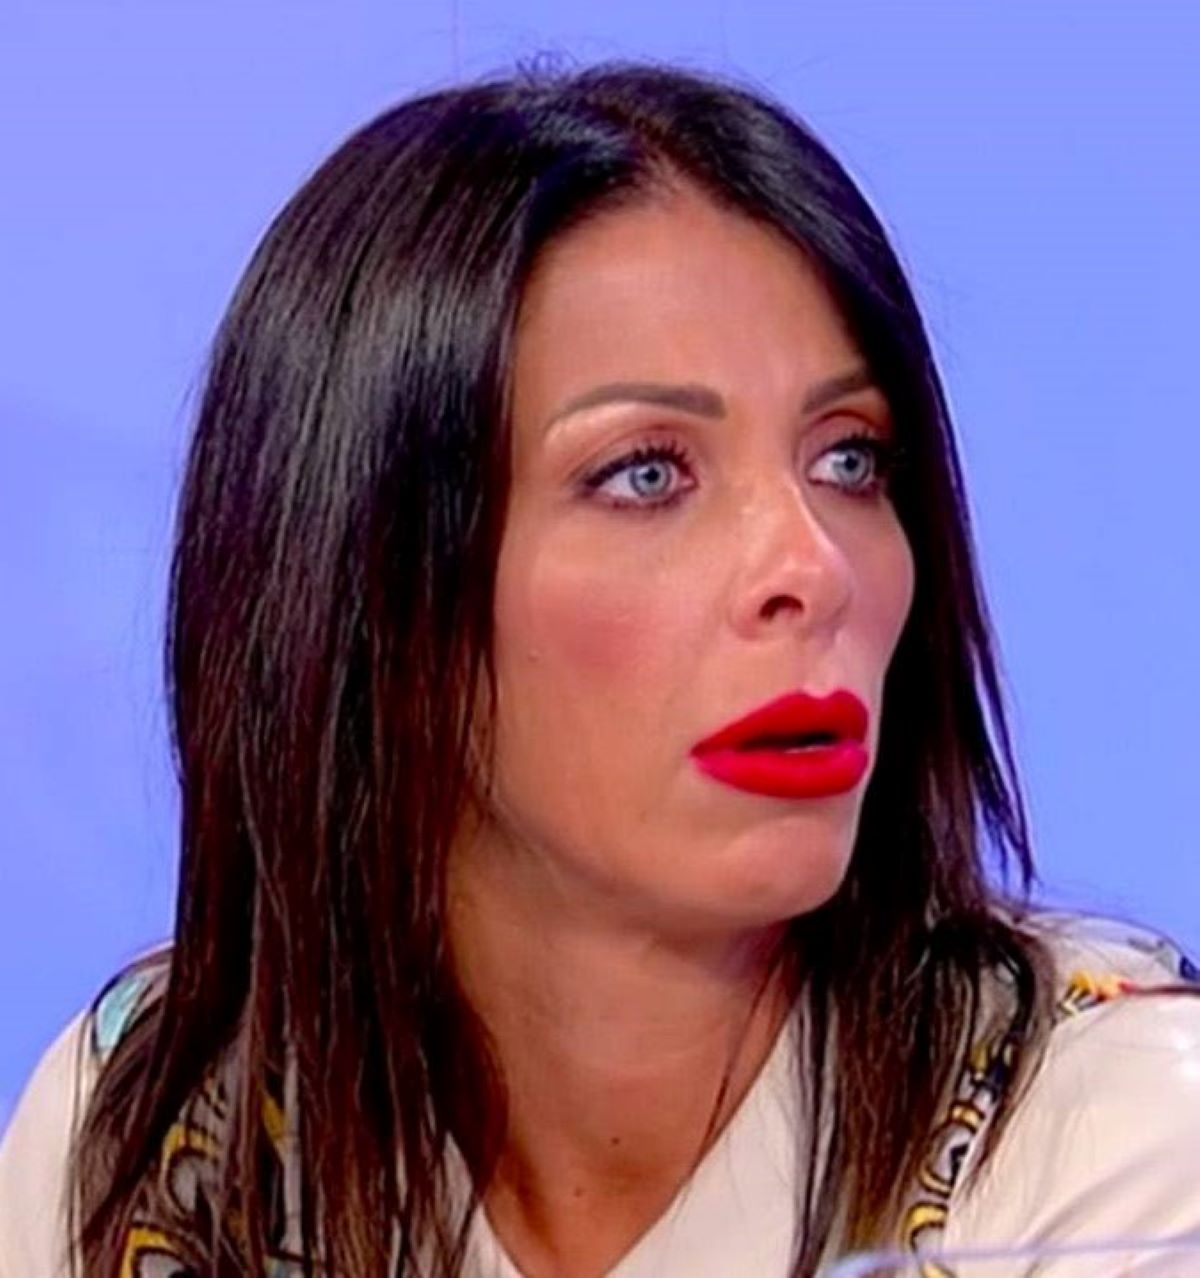 Valentina Autiero UeD Accusa Ritocchini Attacco Instagram